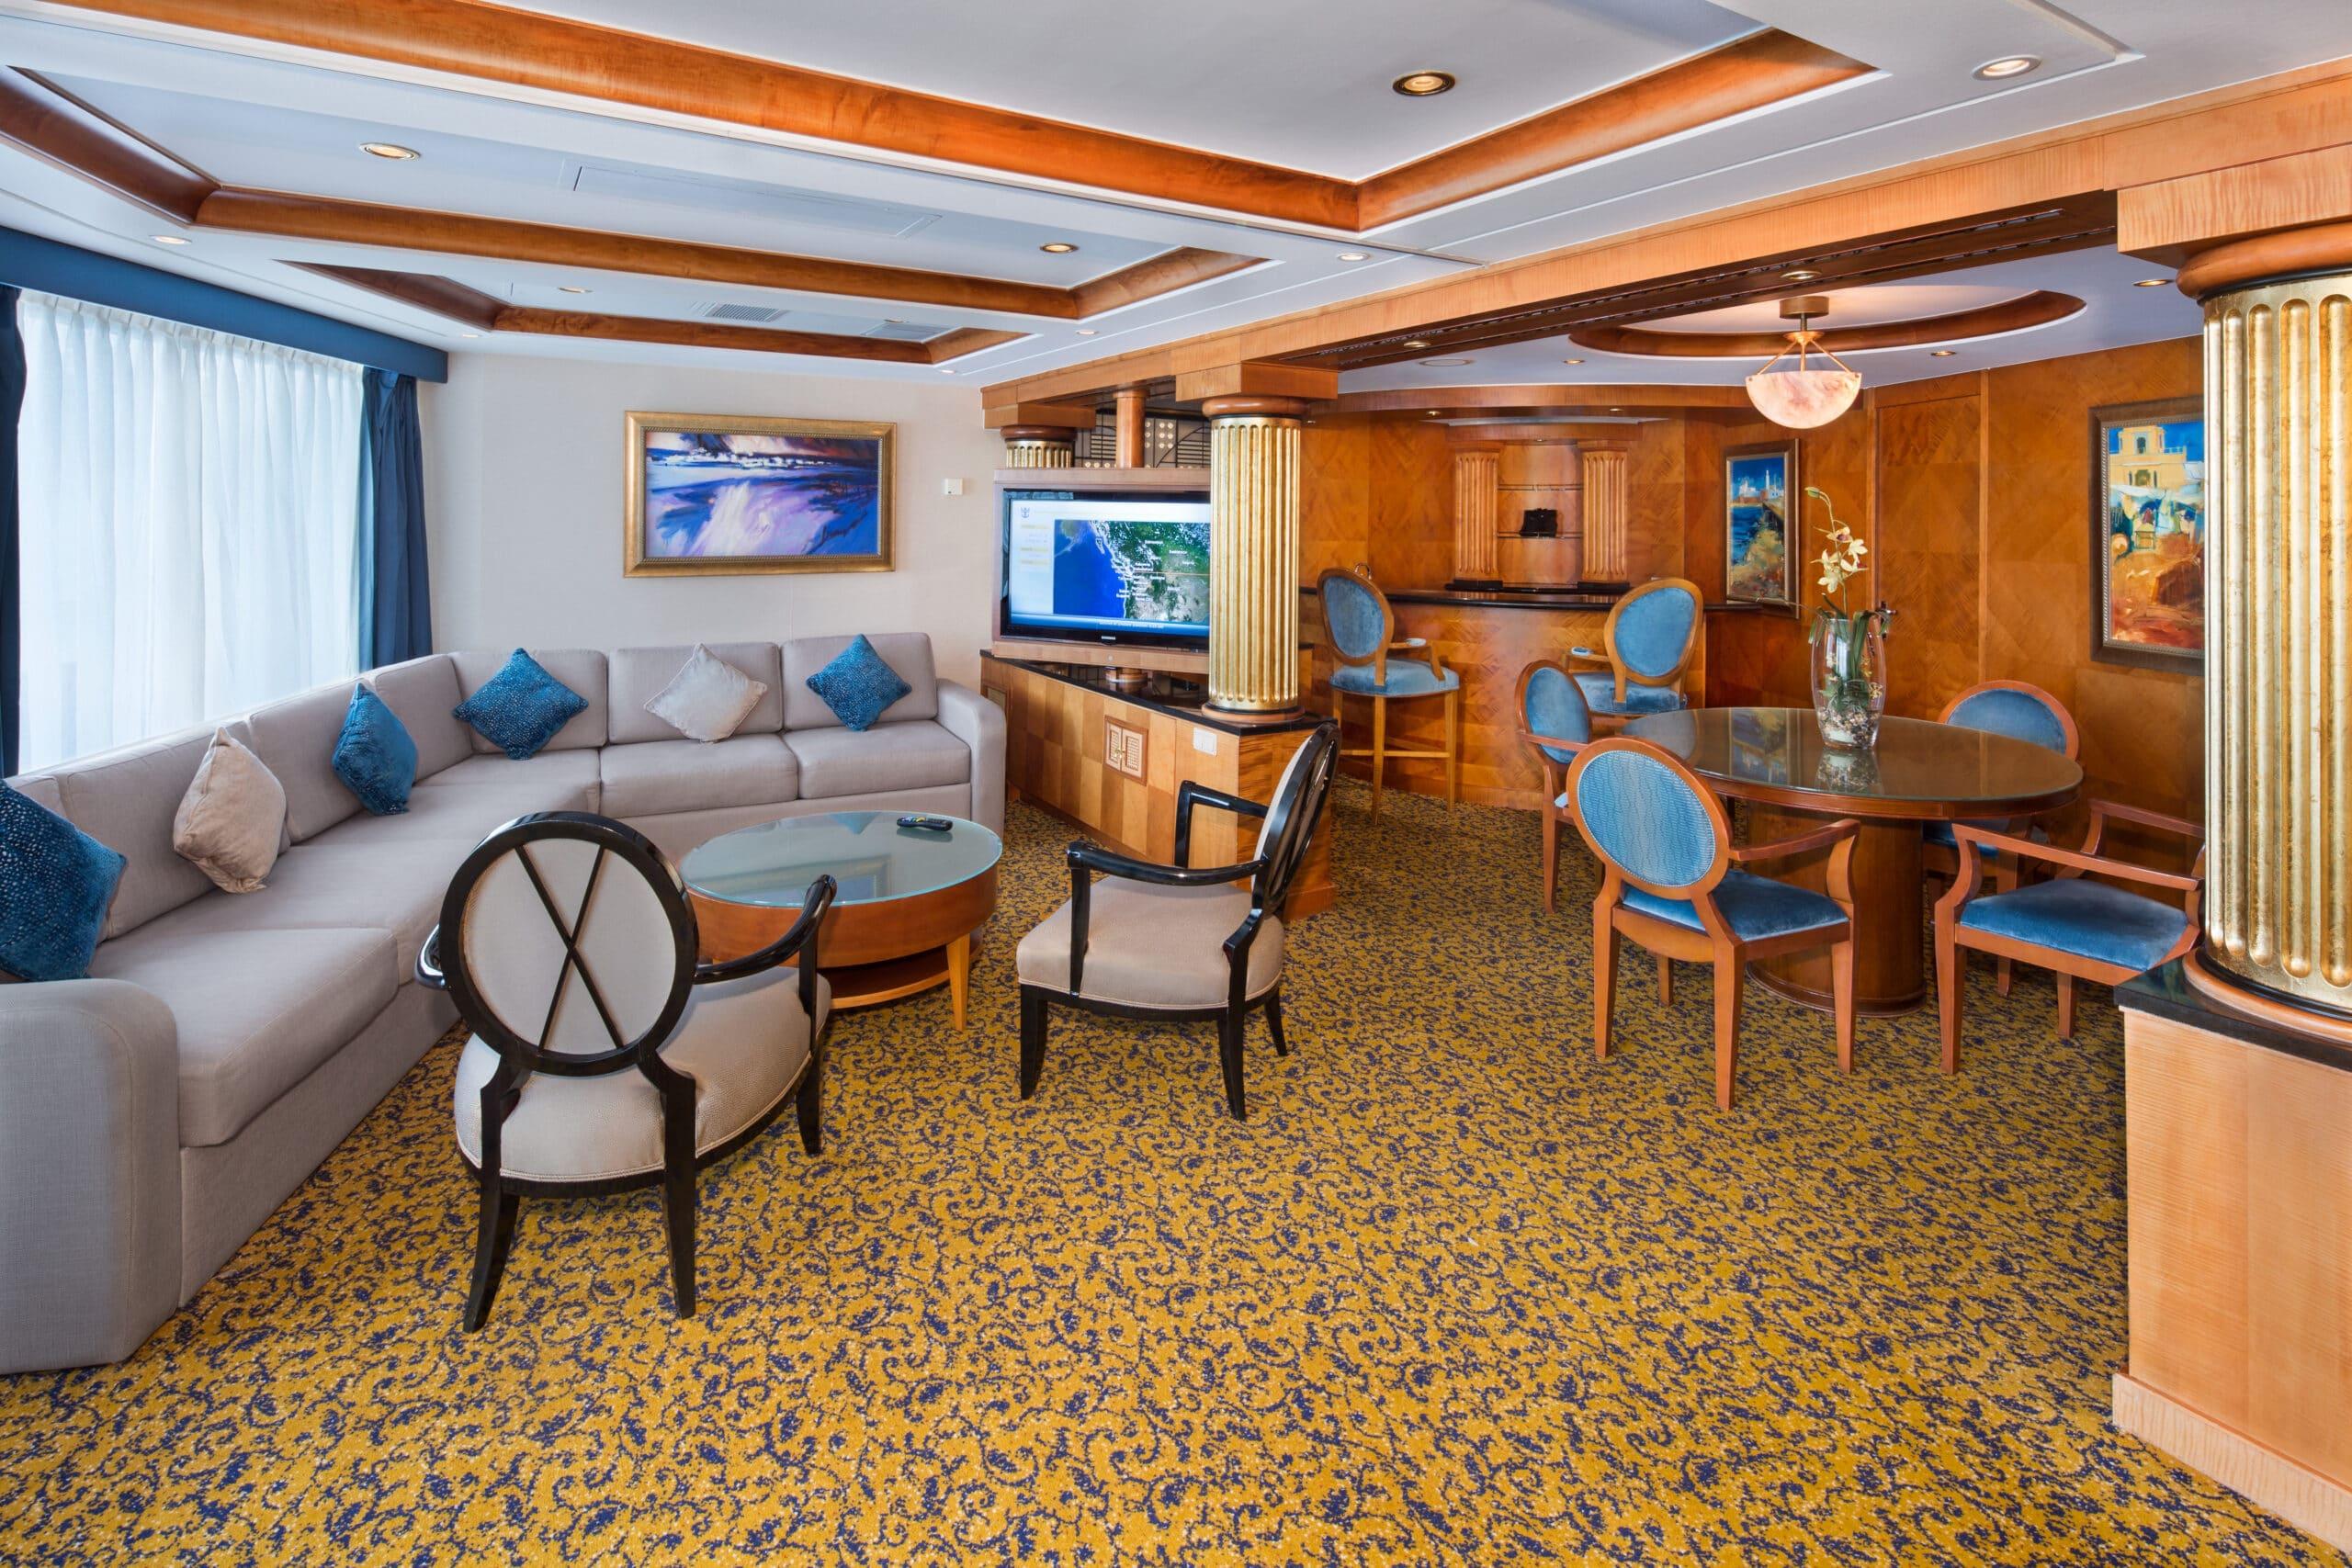 Royal-Caribbean-International-Radiance-of-the-Seas-schip-cruiseschip-categorie-RS-Royal-Suite